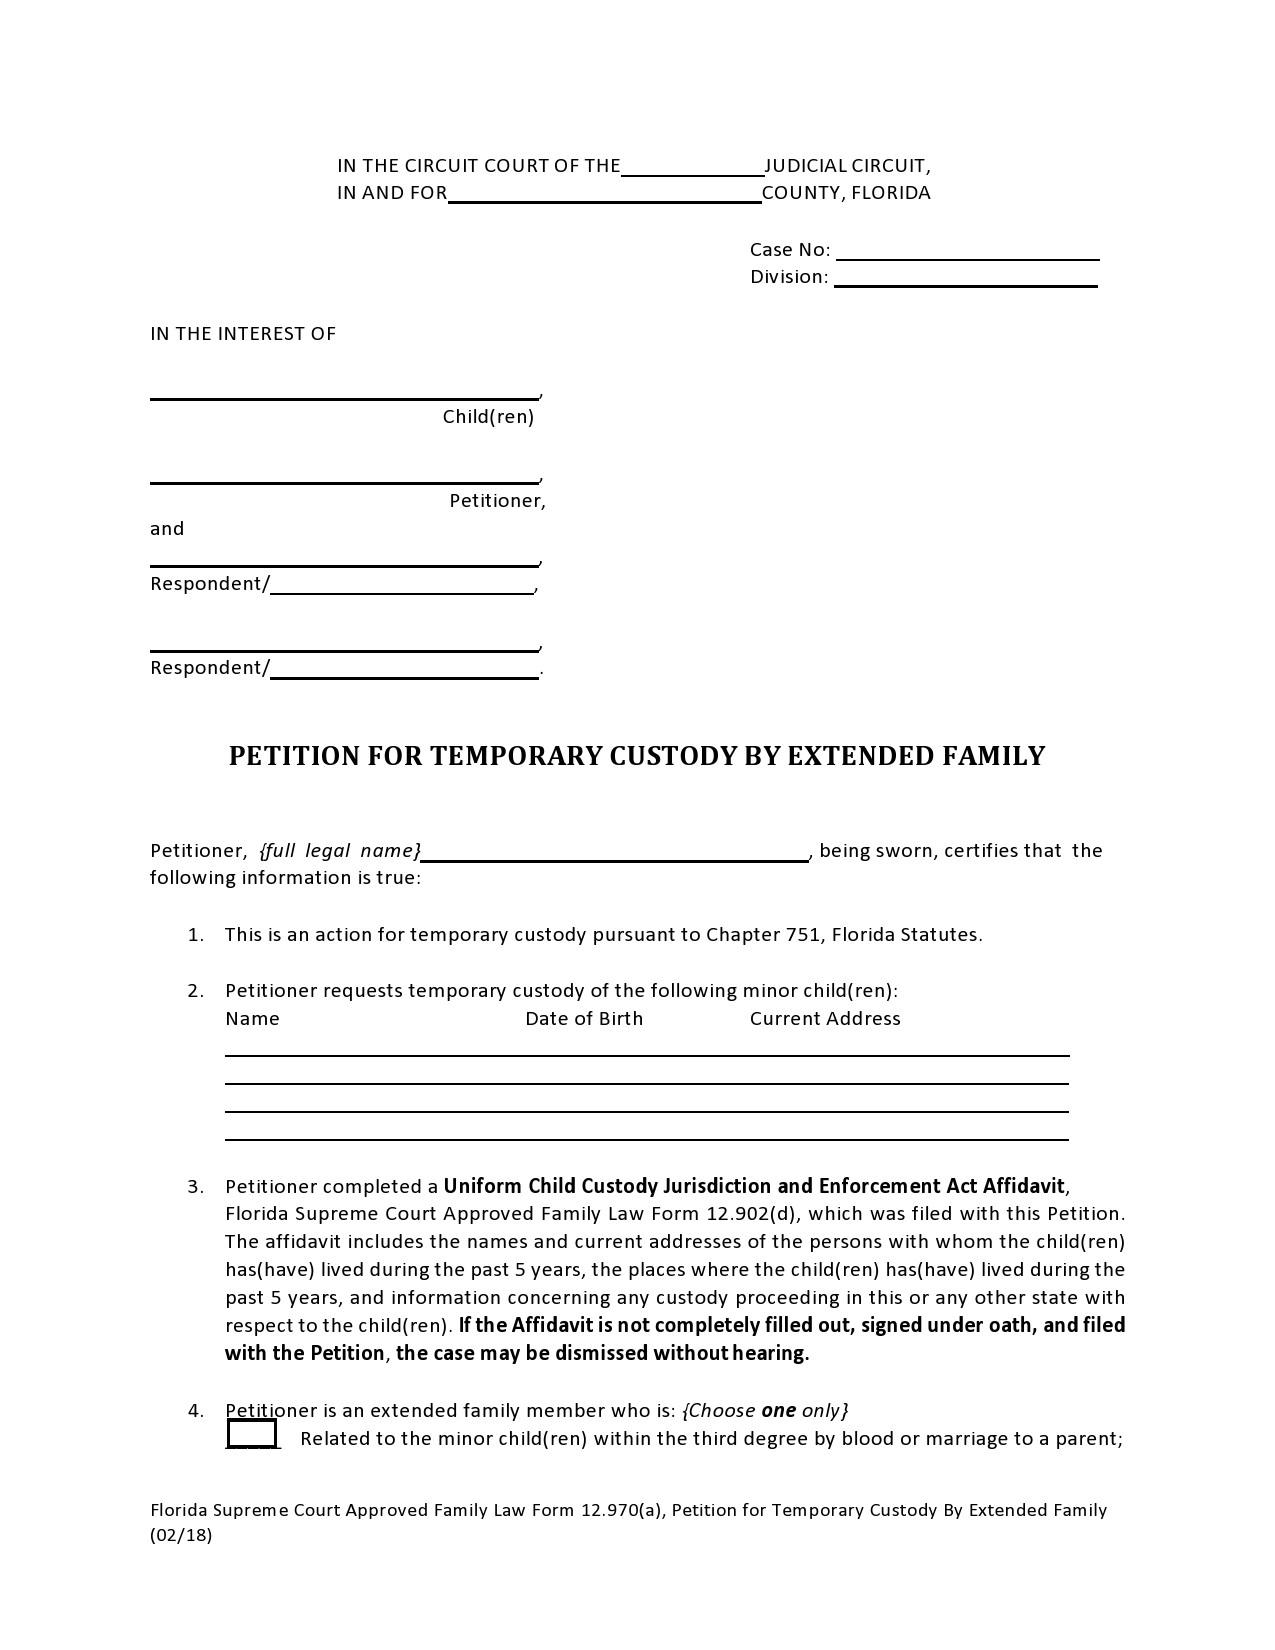 Free temporary guardianship form 05